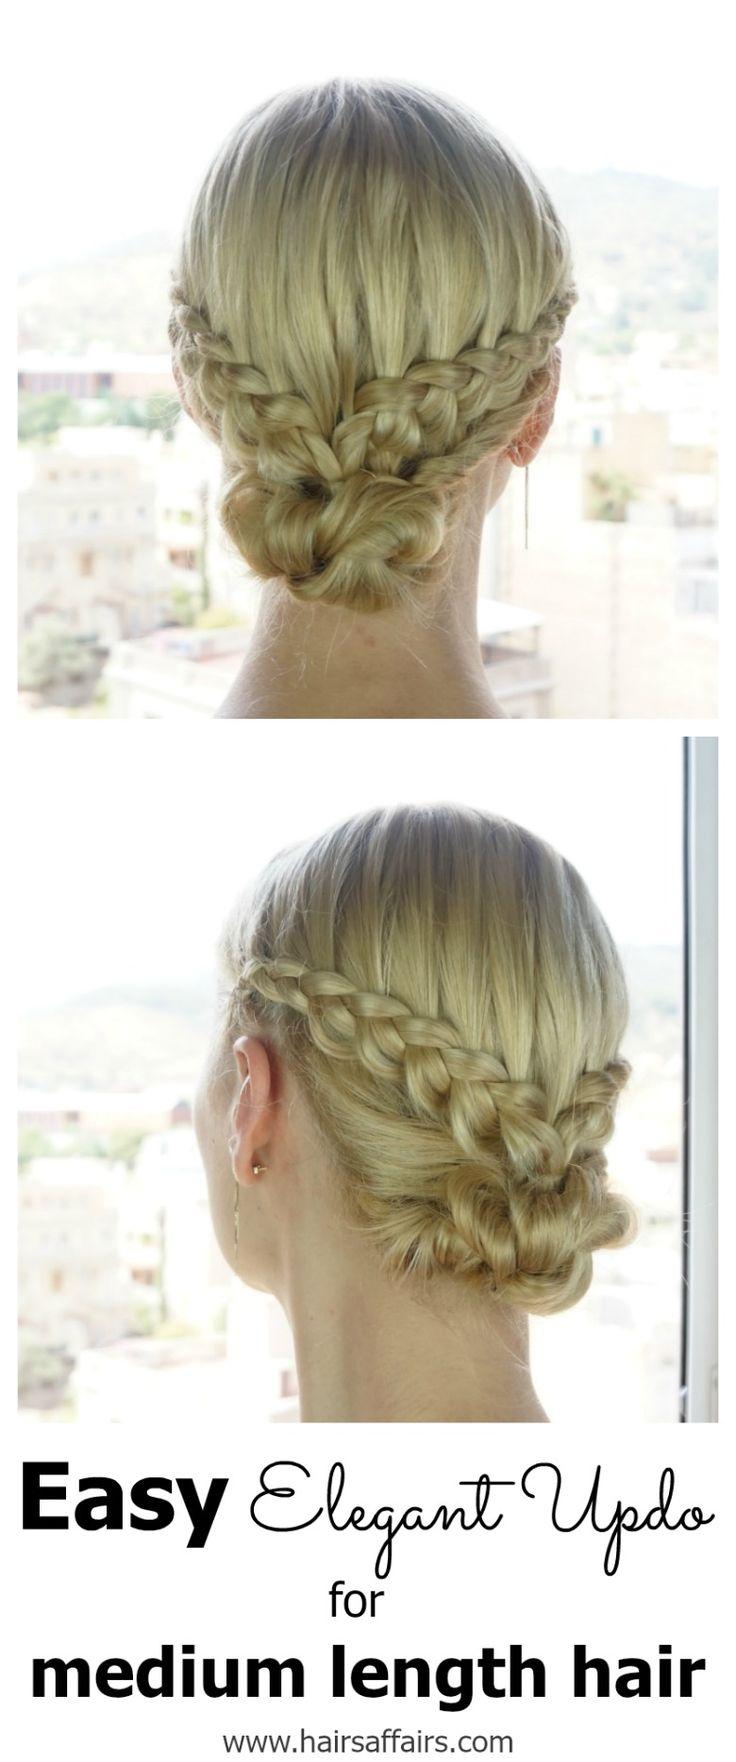 EASY DIY BRAIDED BUN – HAIR TUTORIAL https://hairsaffairs.com/easy-diy-braided-bun-hair-tutorial/